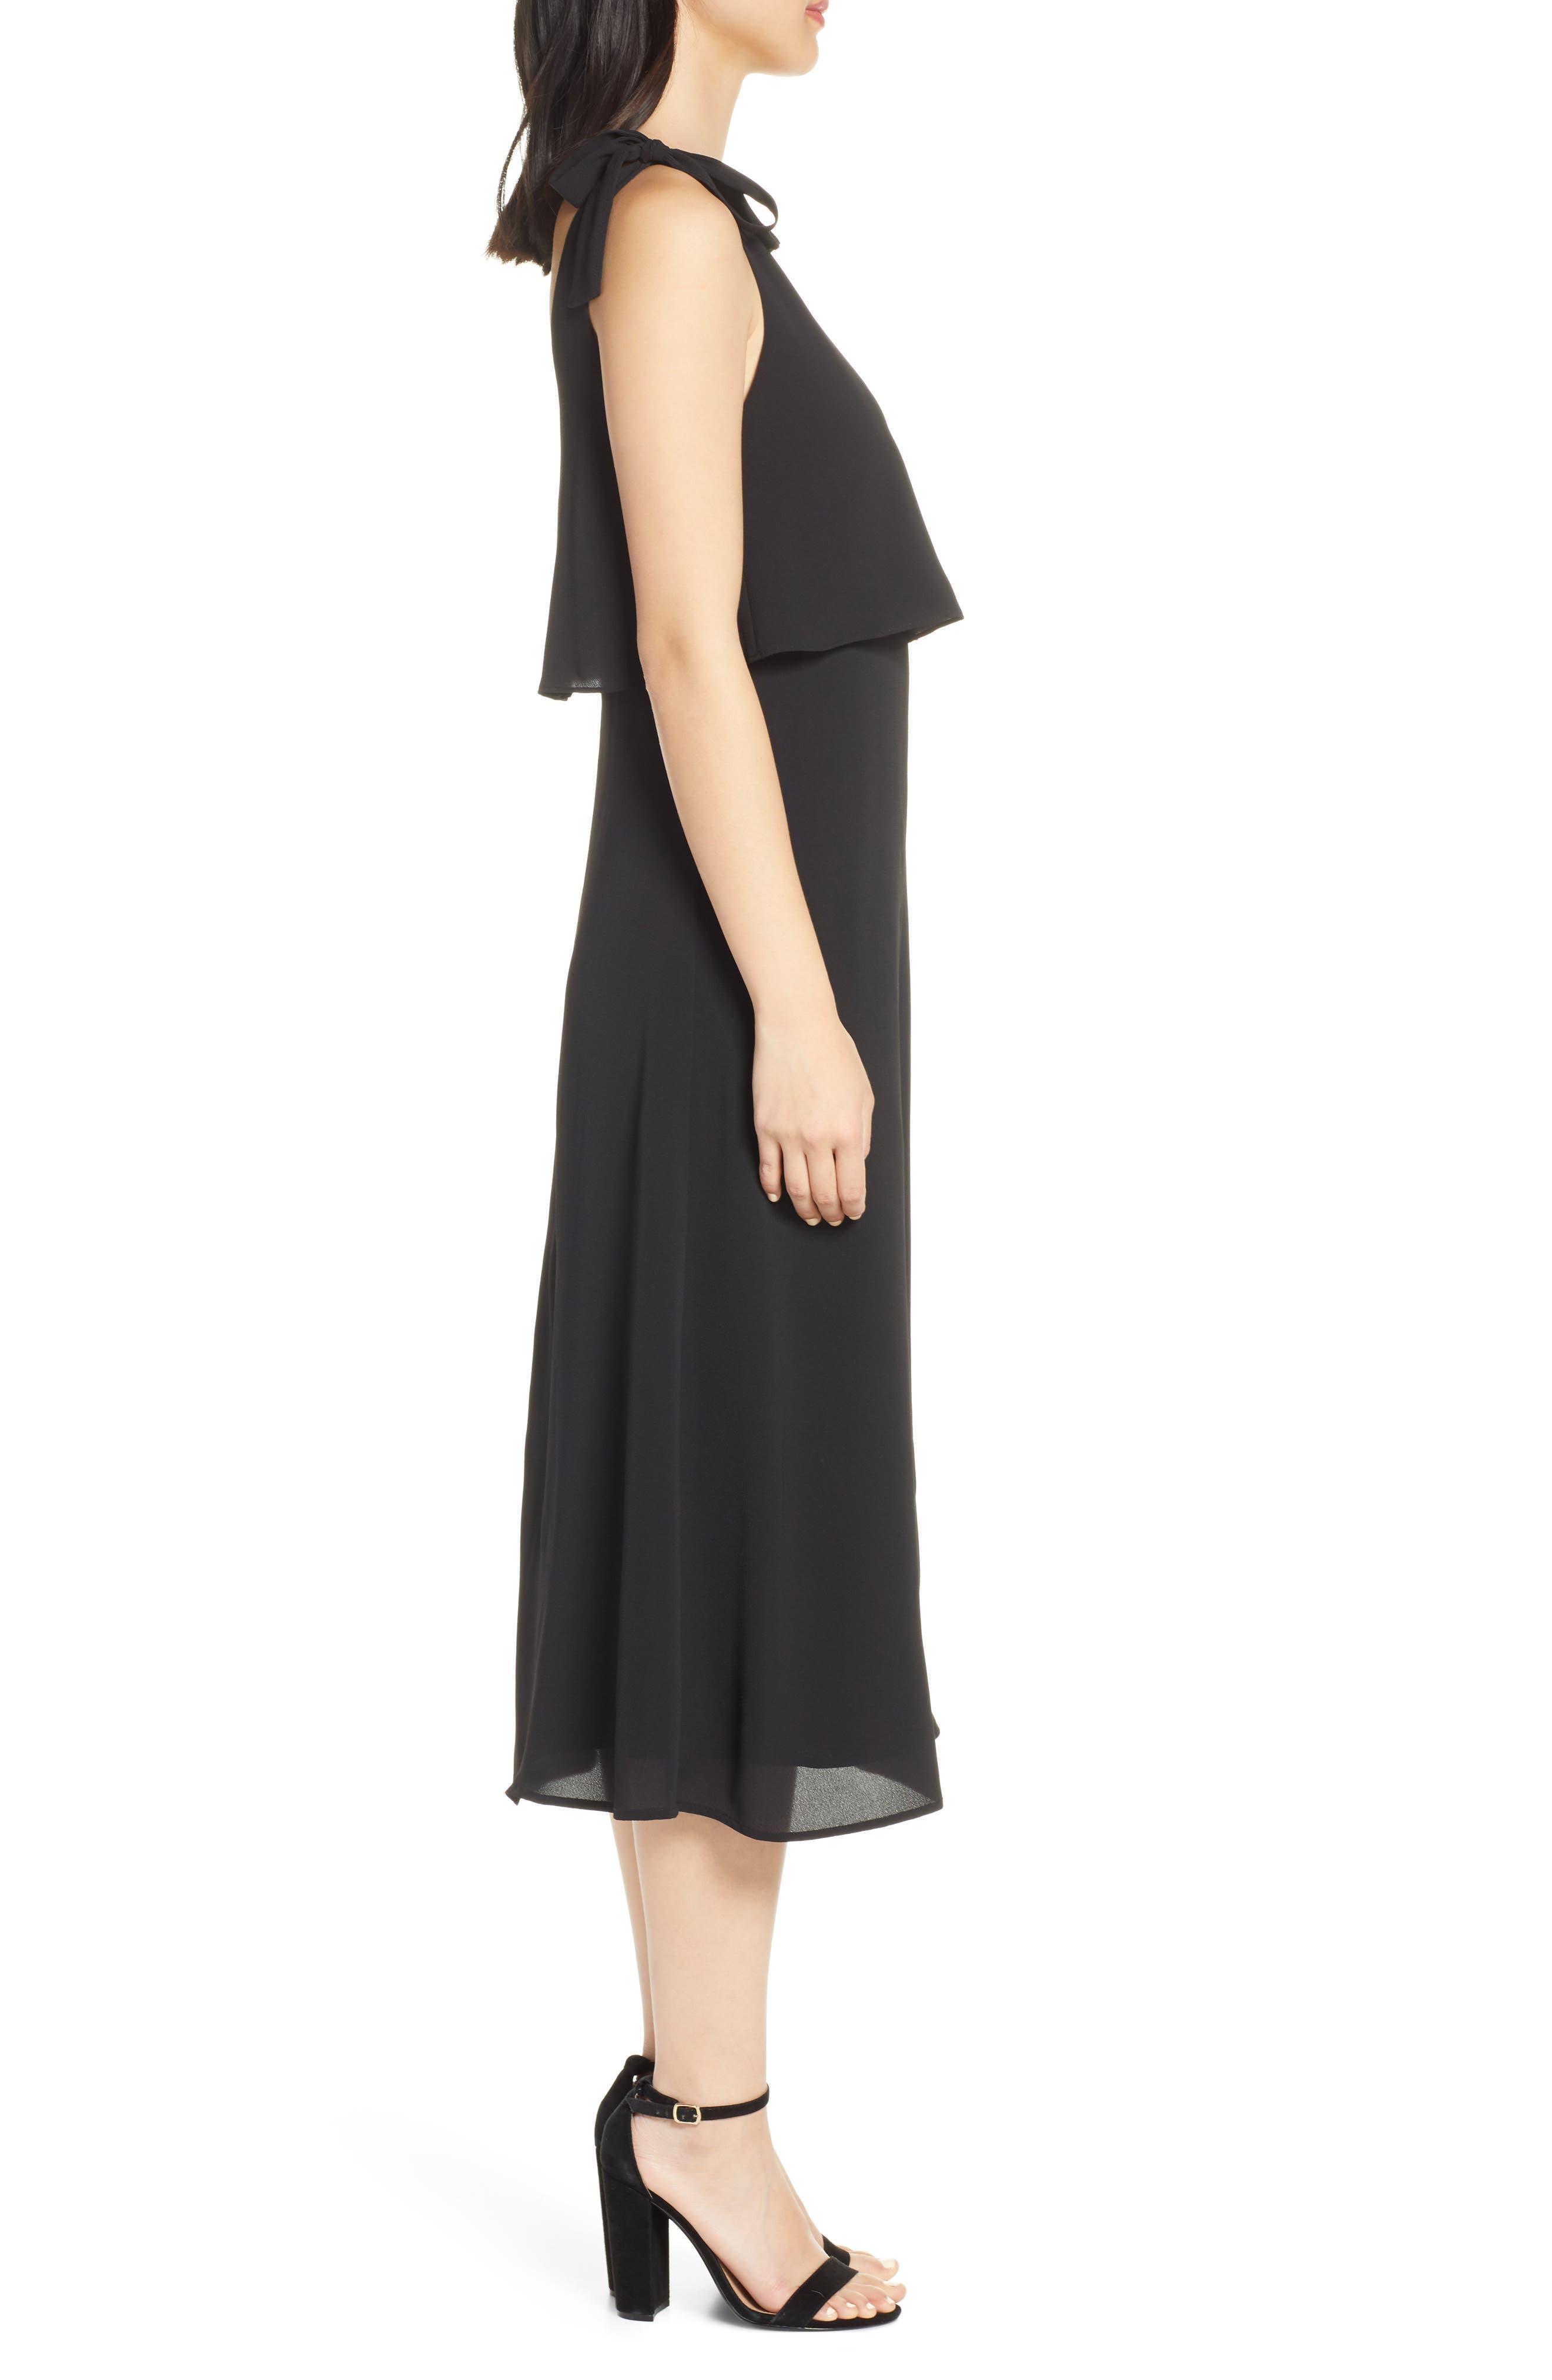 CHARLES HENRY, Tie Shoulder Popover Midi Dress, Alternate thumbnail 4, color, BLACK